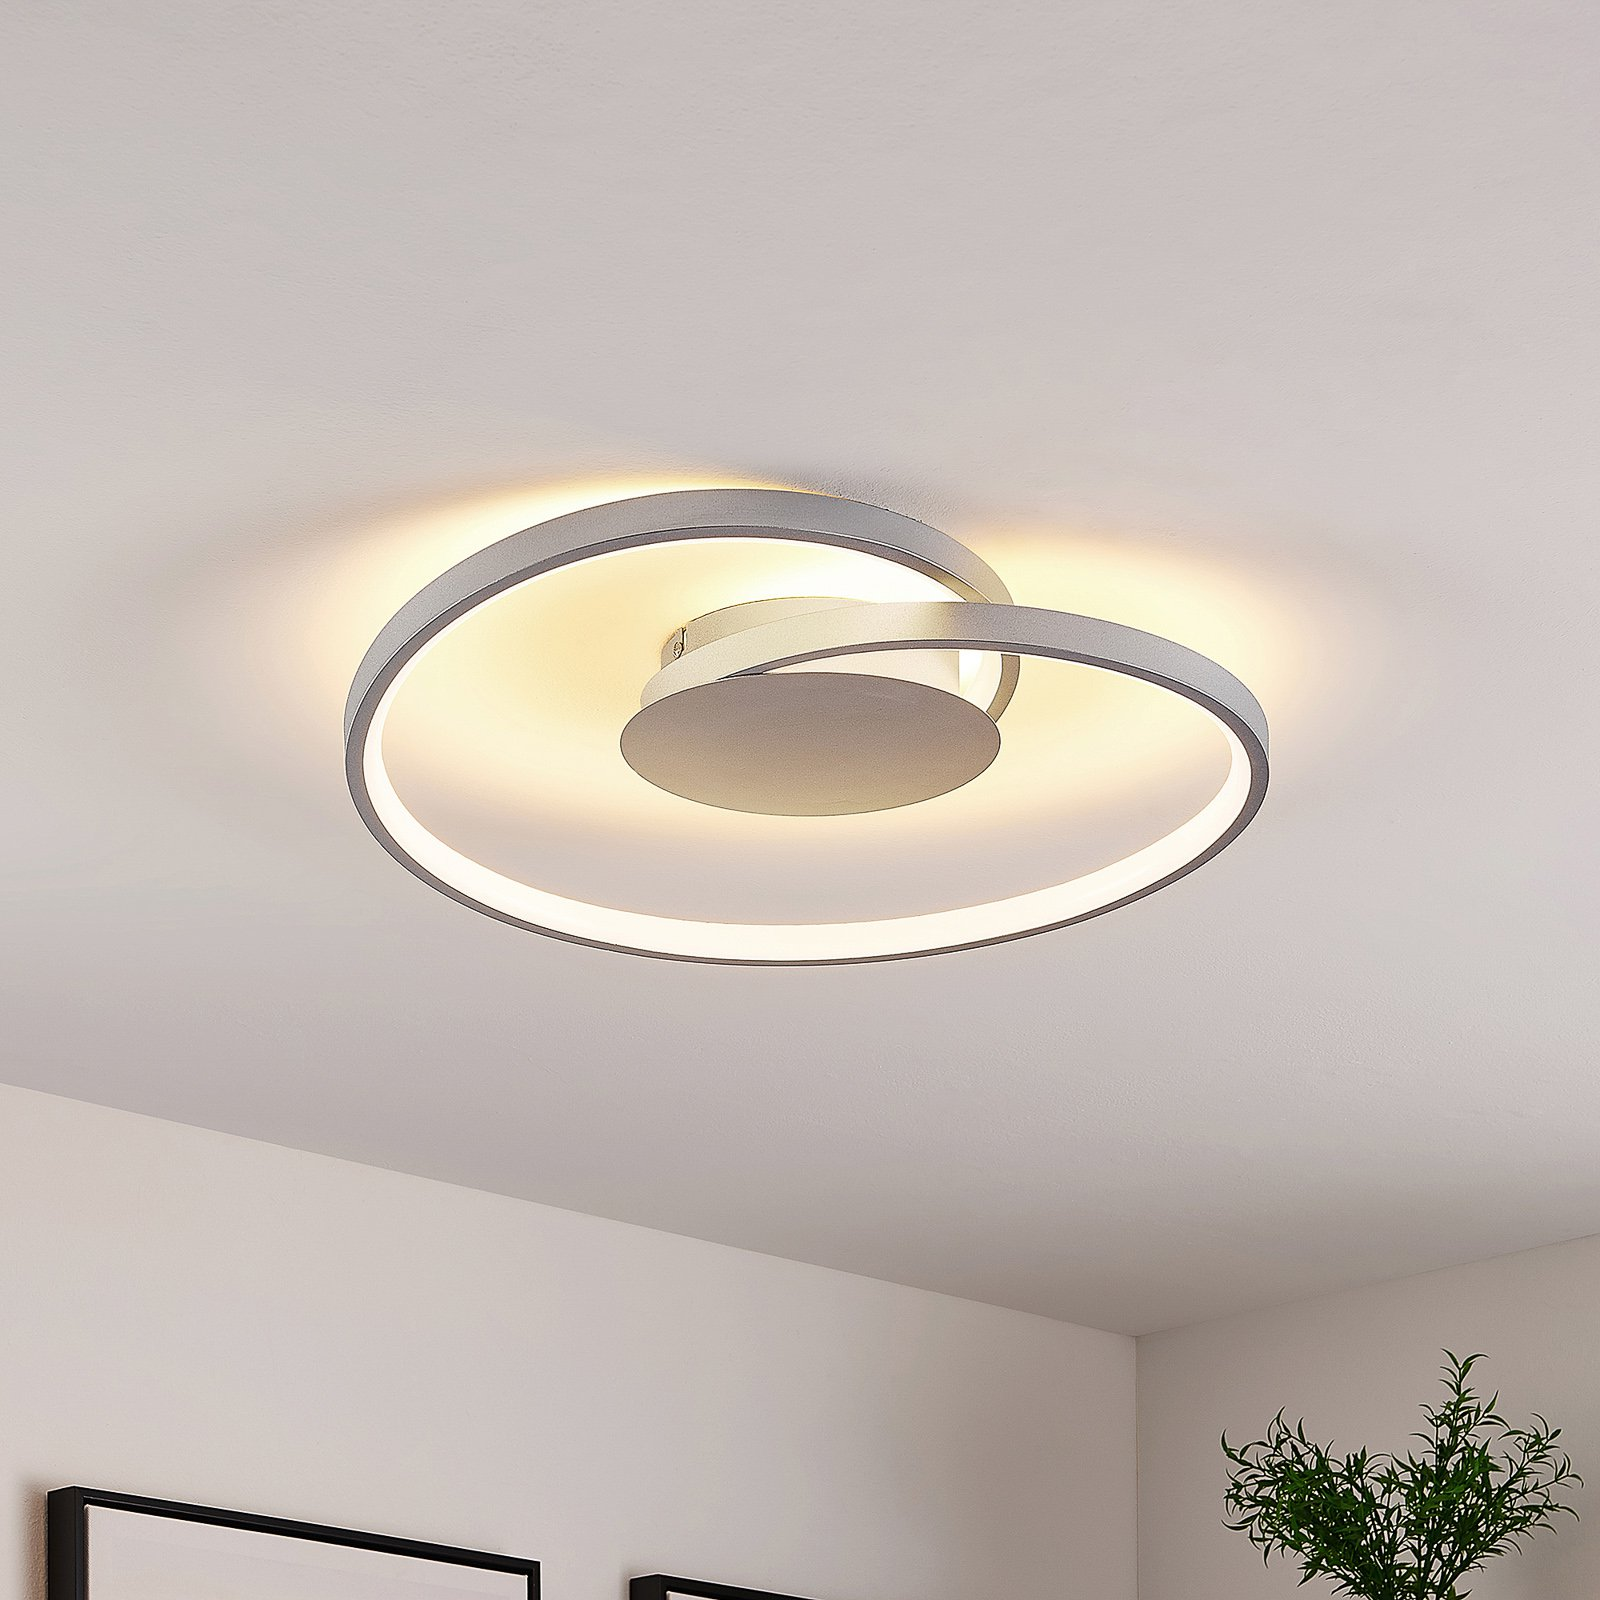 Lucande Enesa LED-taklampe, rund